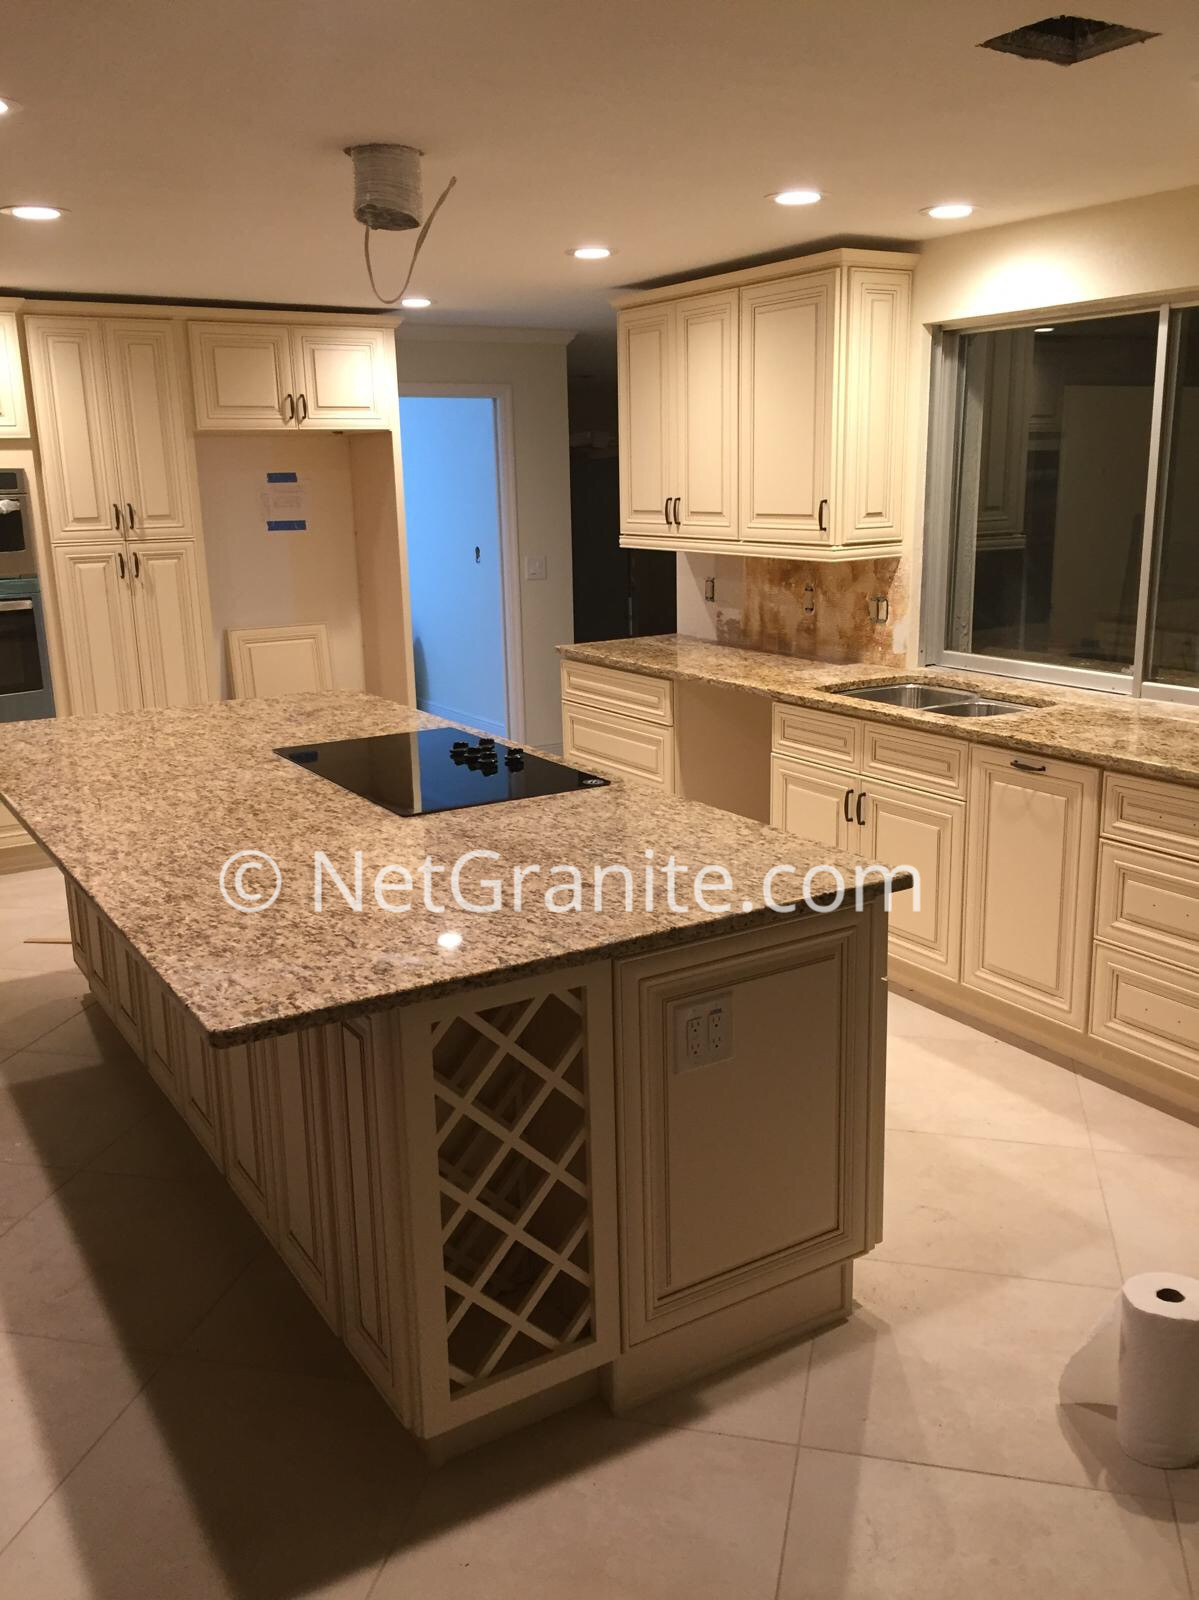 Countertops Installation In Fort Myers   Granite U0026 Quartz   NetGranite